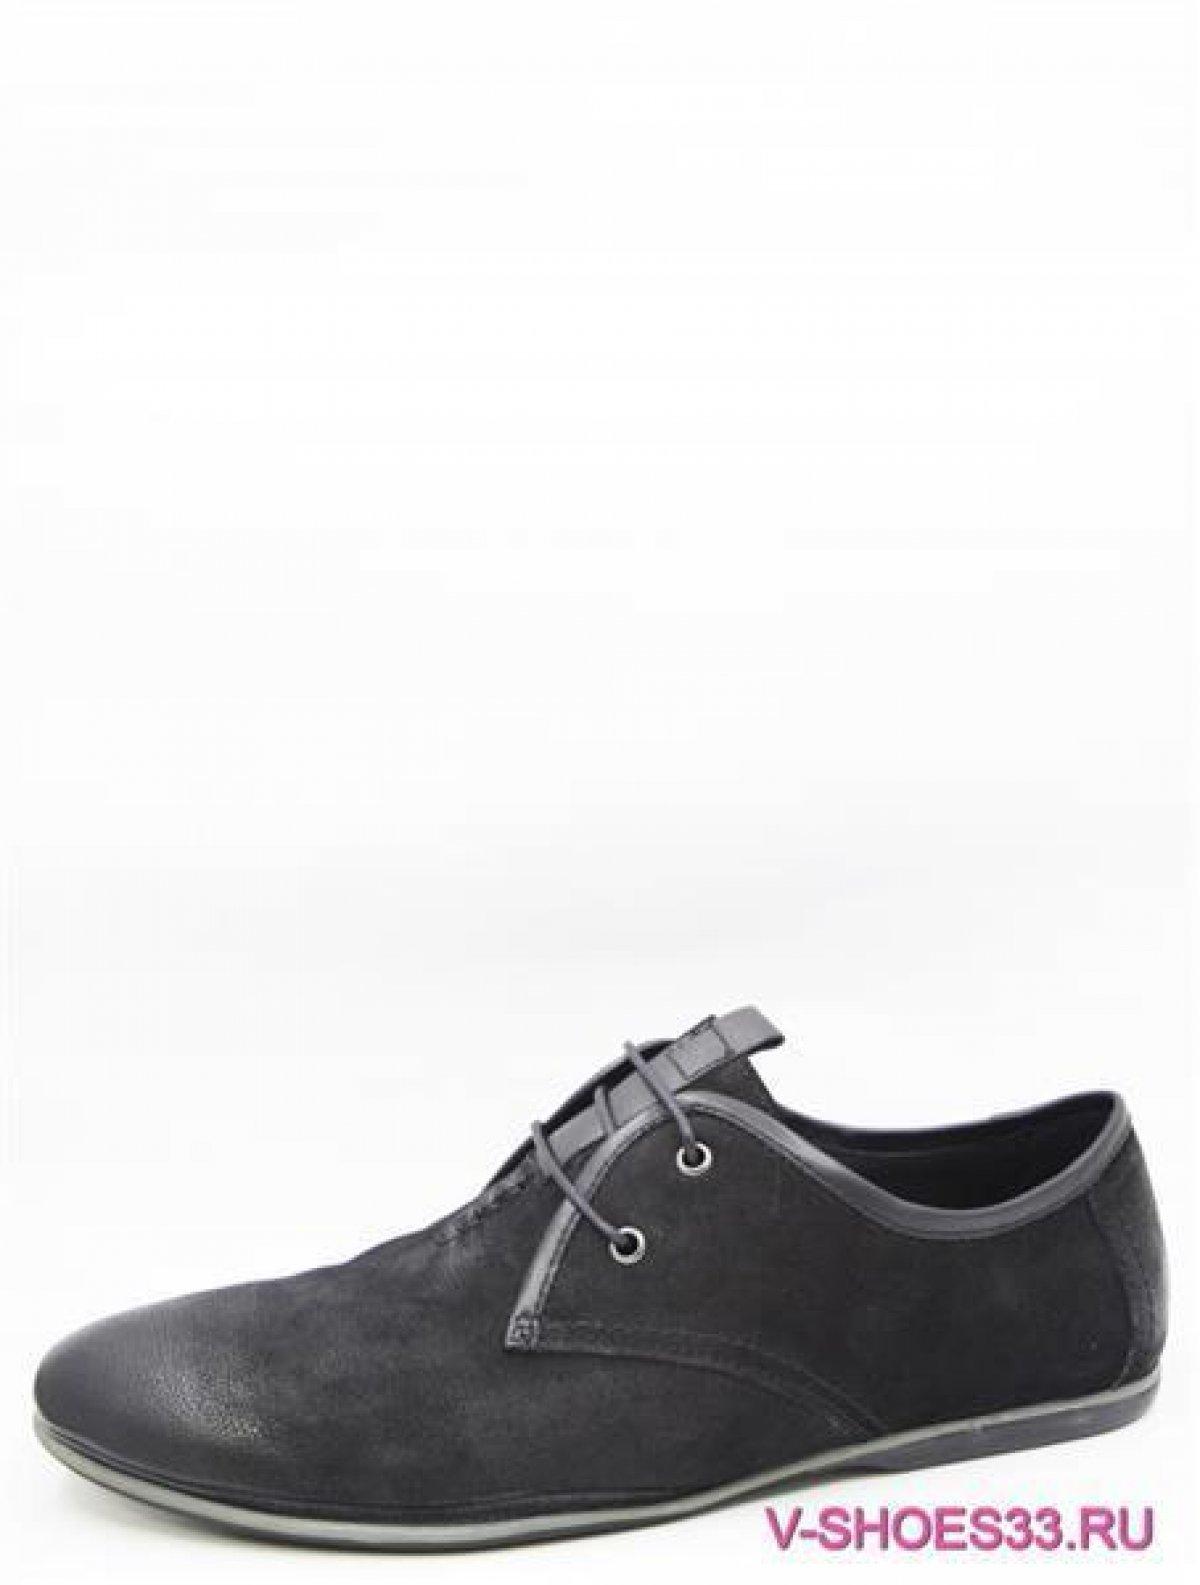 K83-075106 туфли мужские